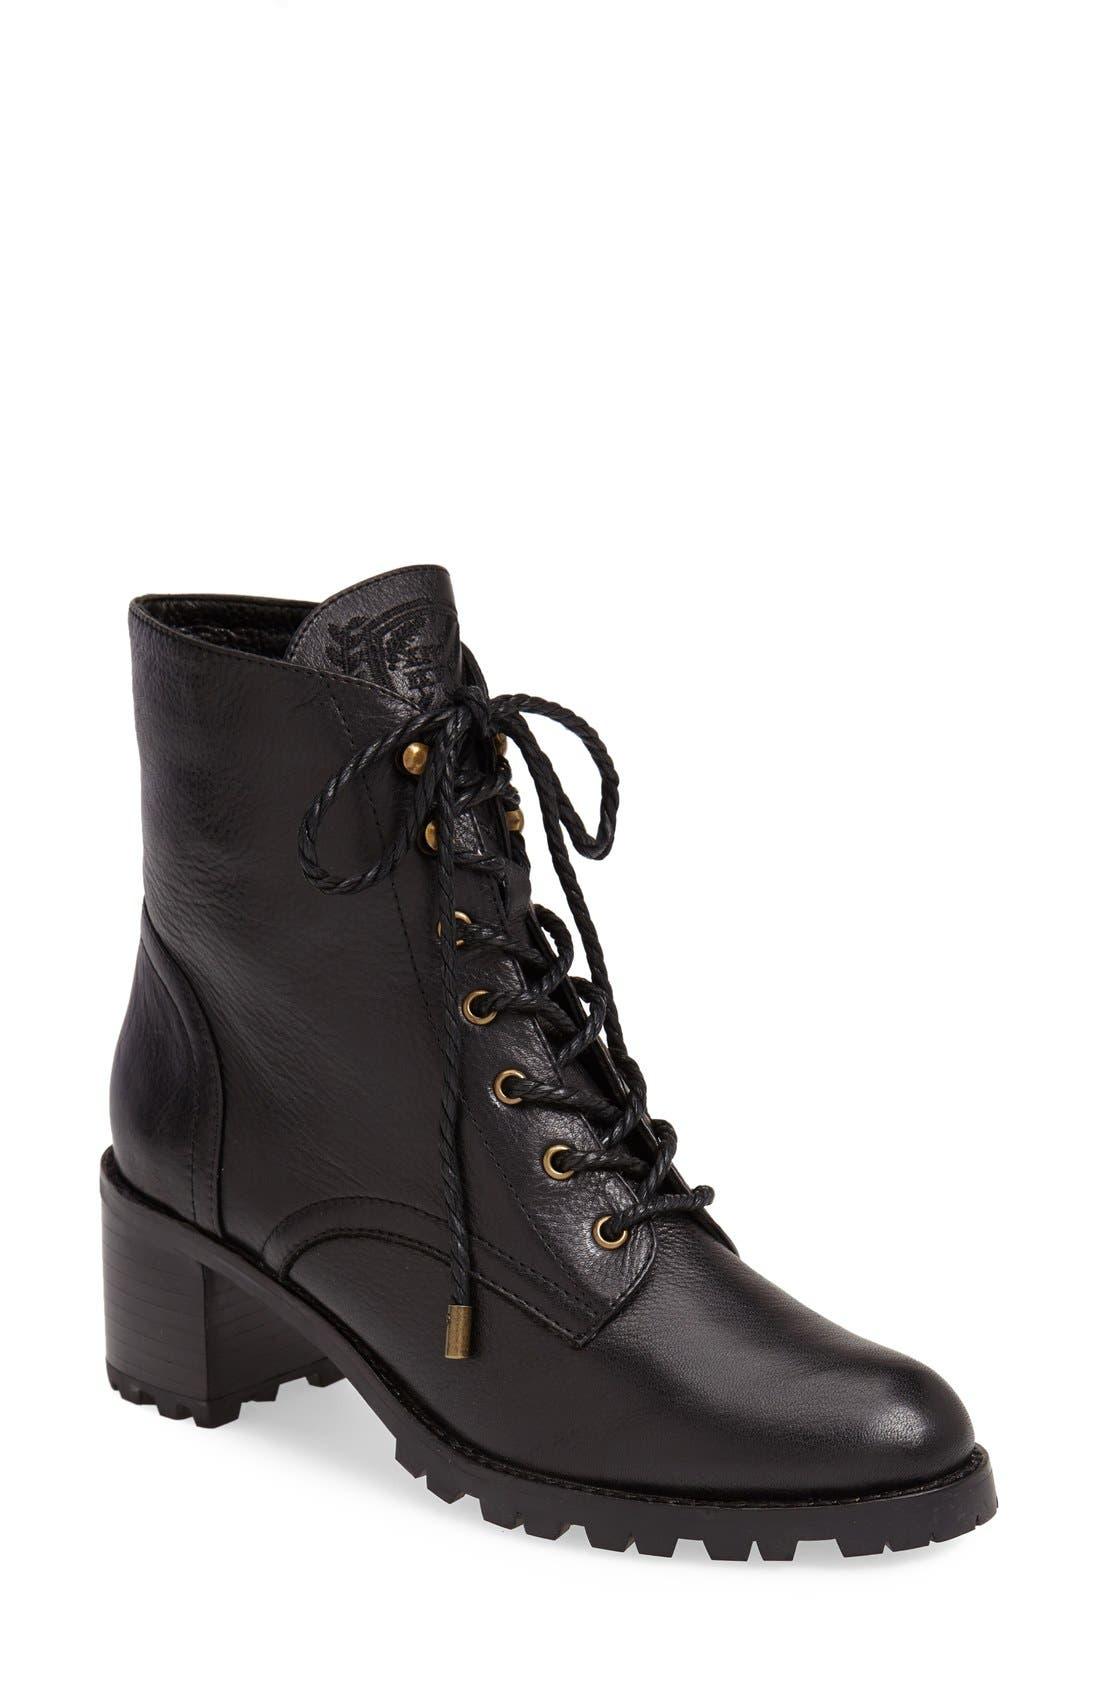 Alternate Image 1 Selected - Joie 'Ashbury' Boot (Women)